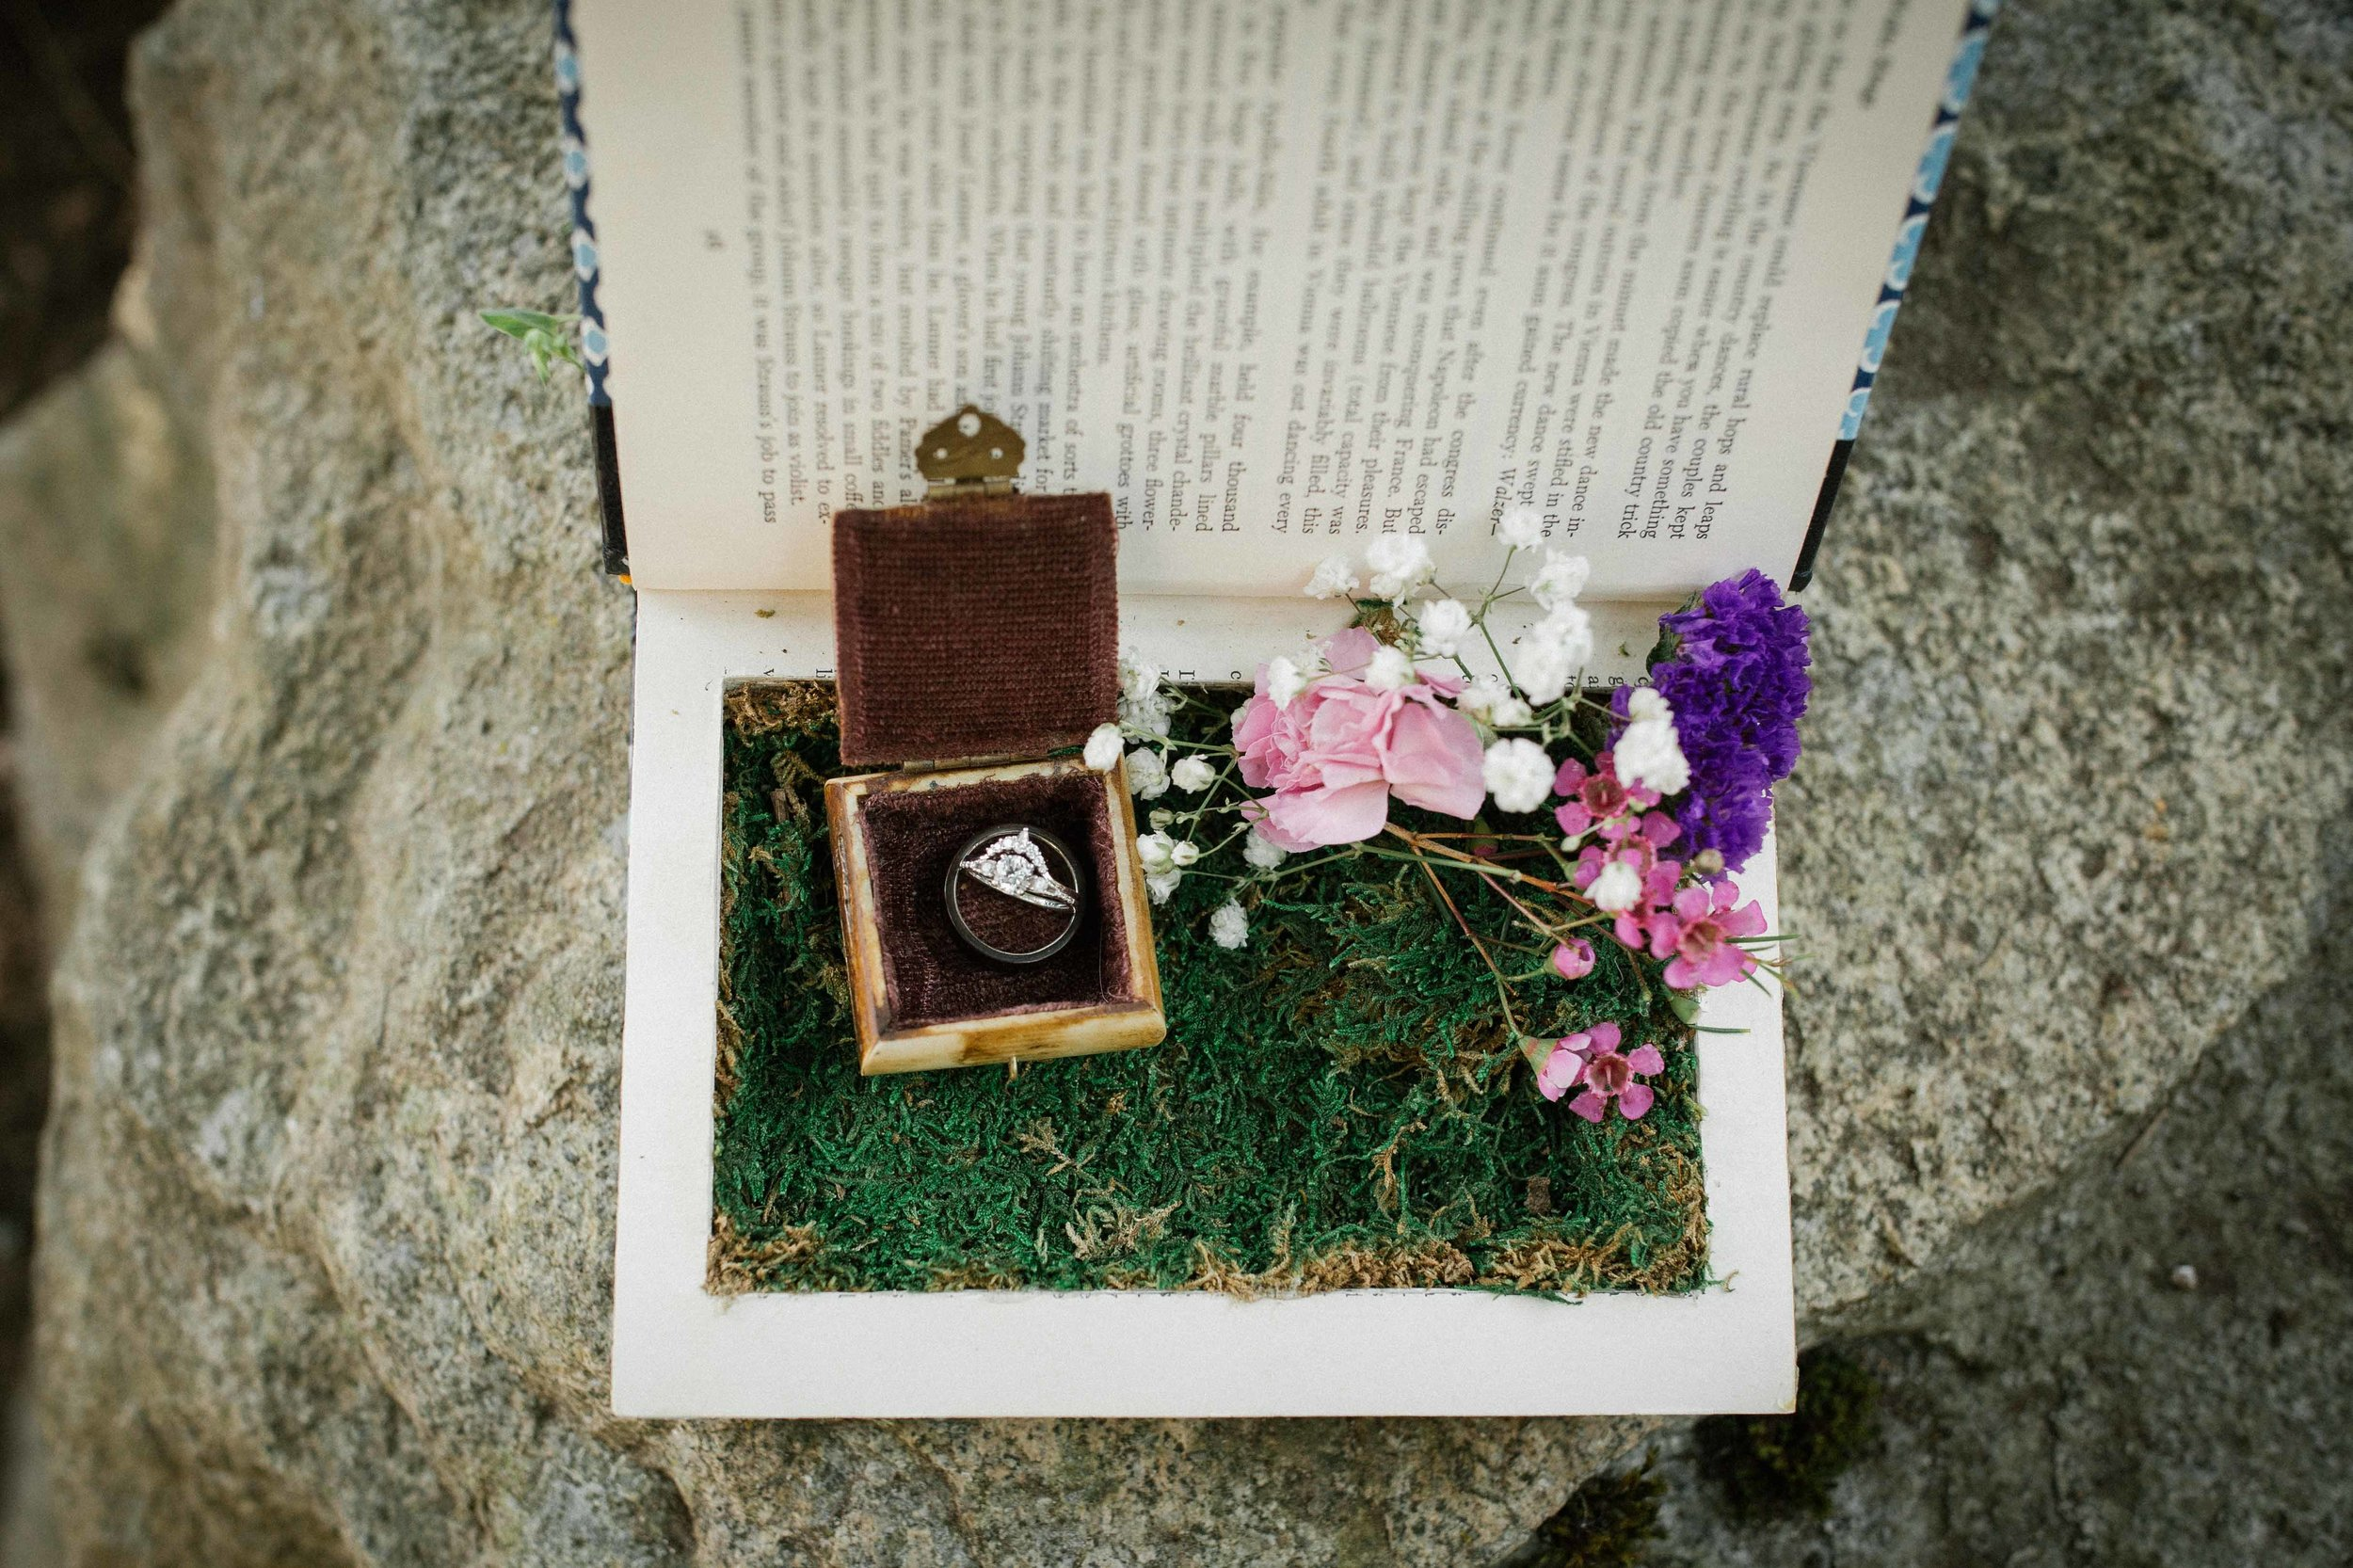 deception-pass-wedding-3.jpg